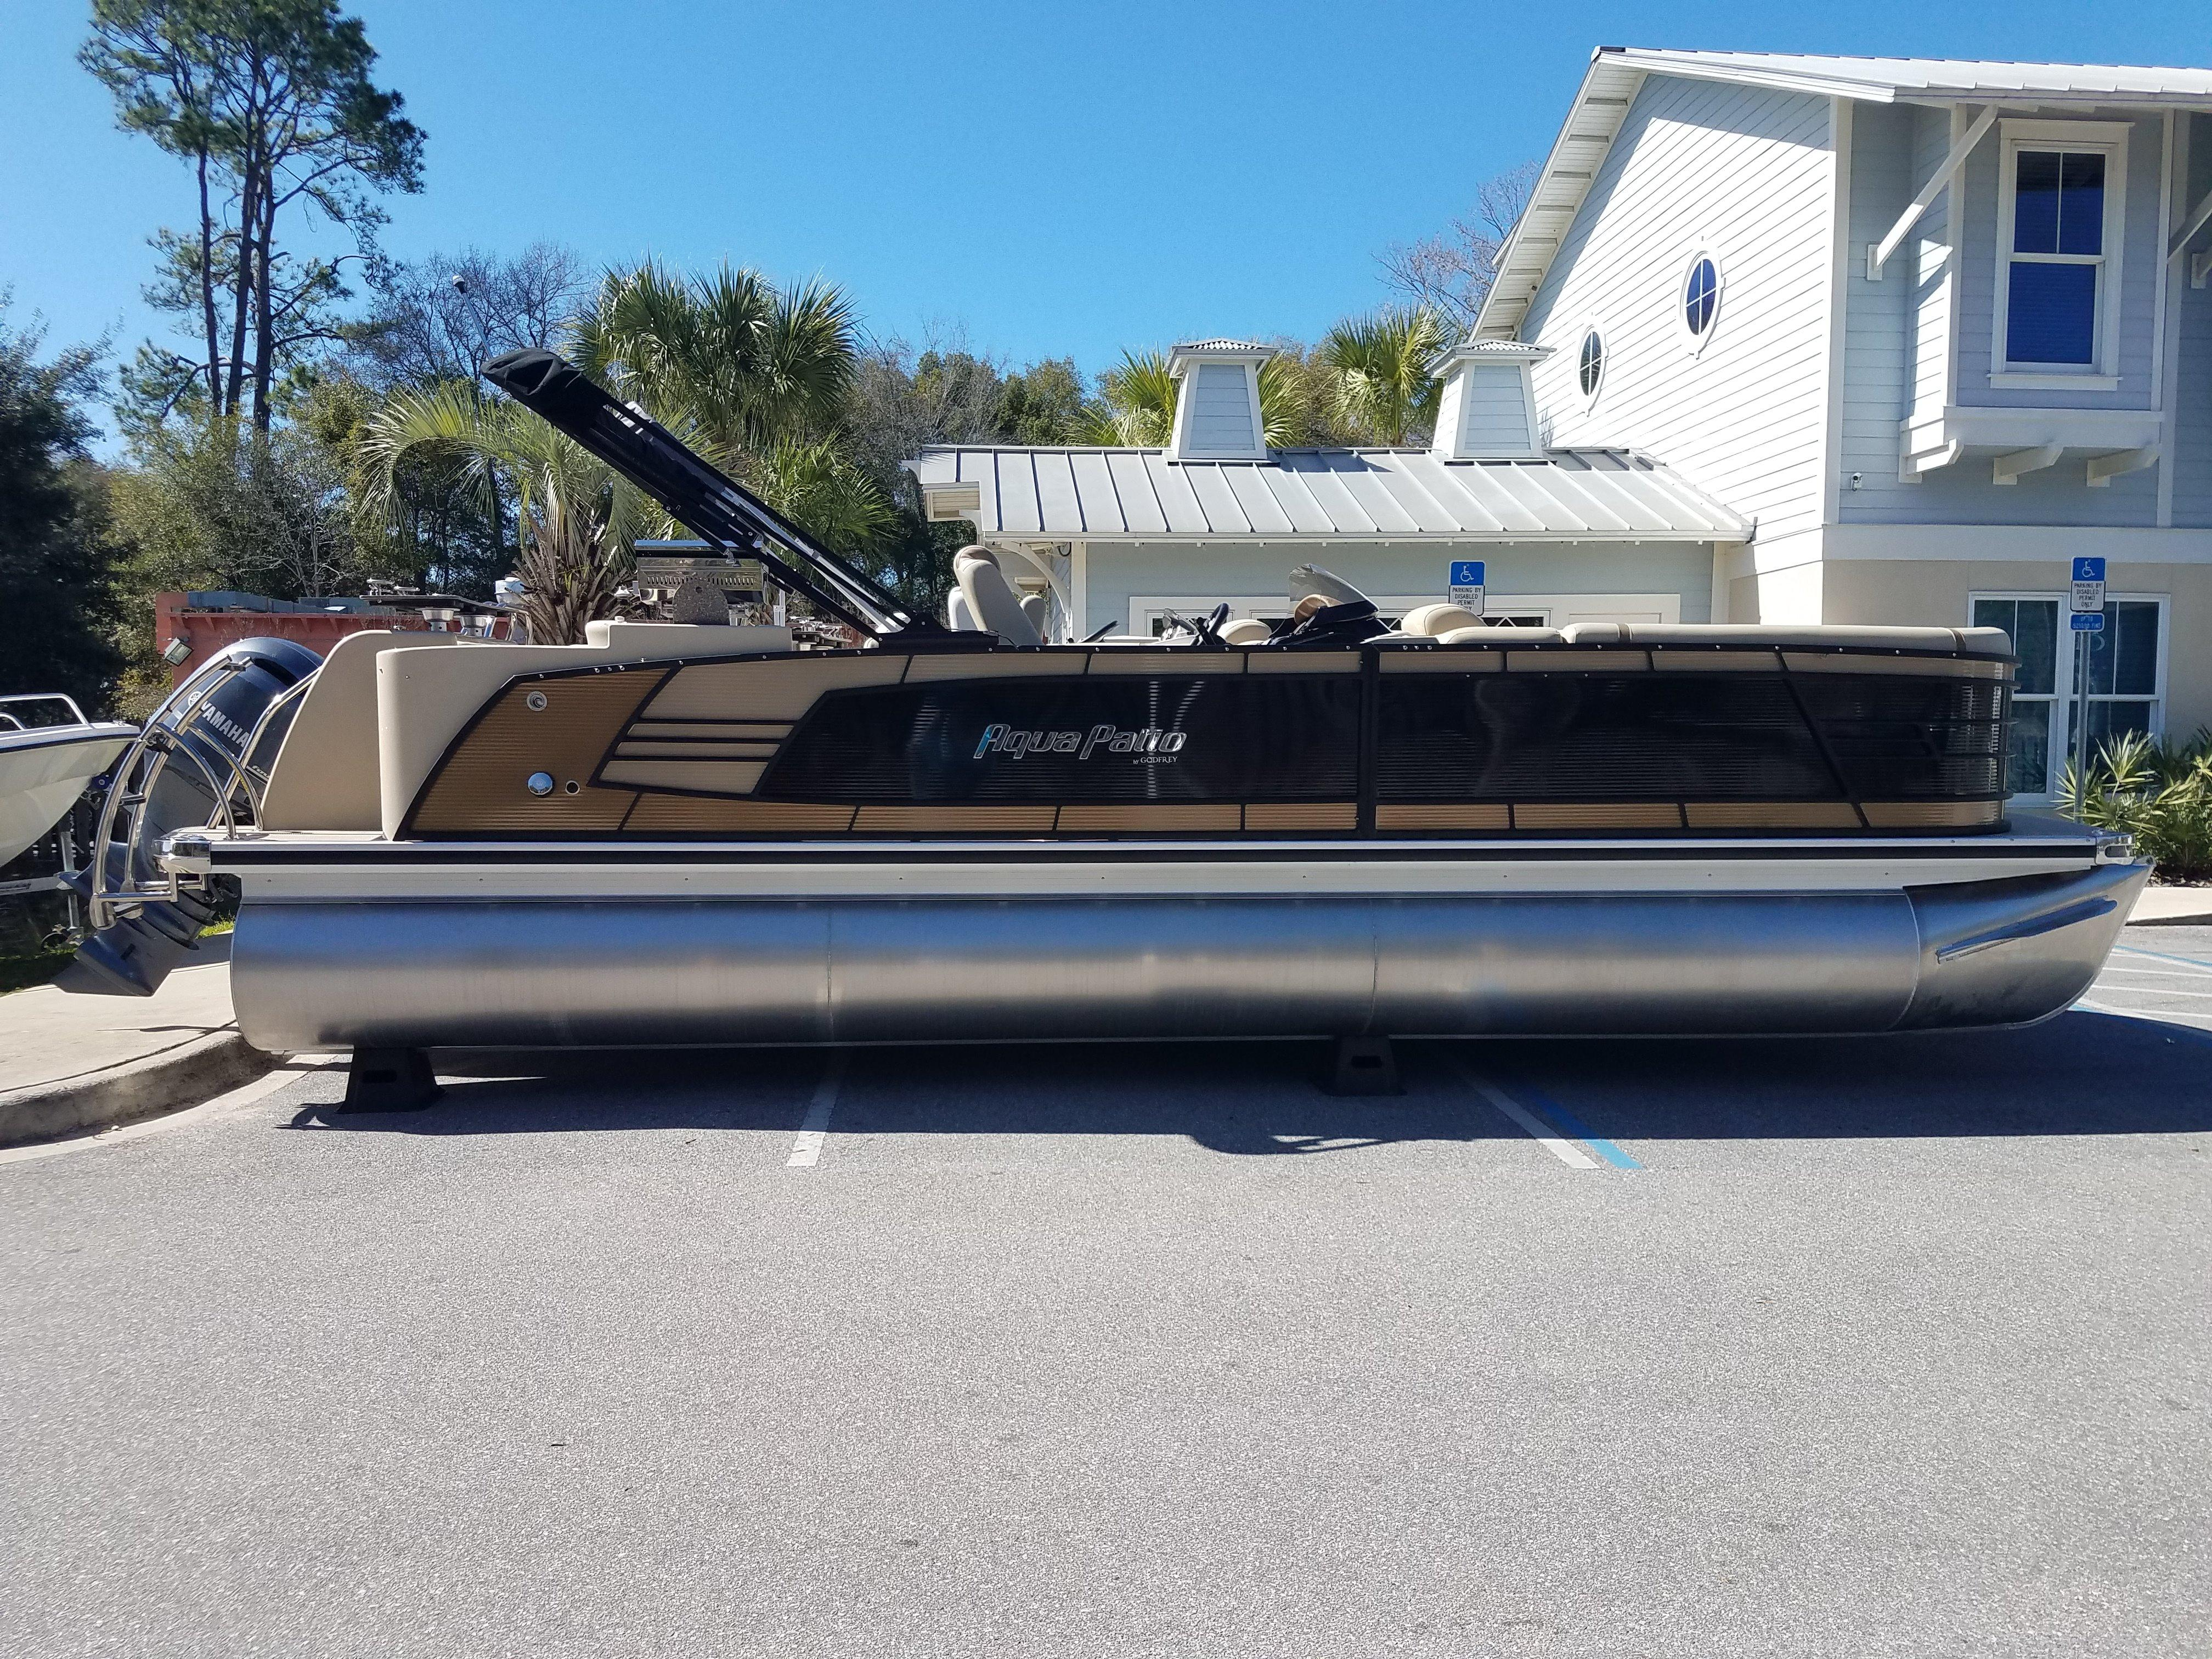 Aqua Patio Boats Home Design Ideas and